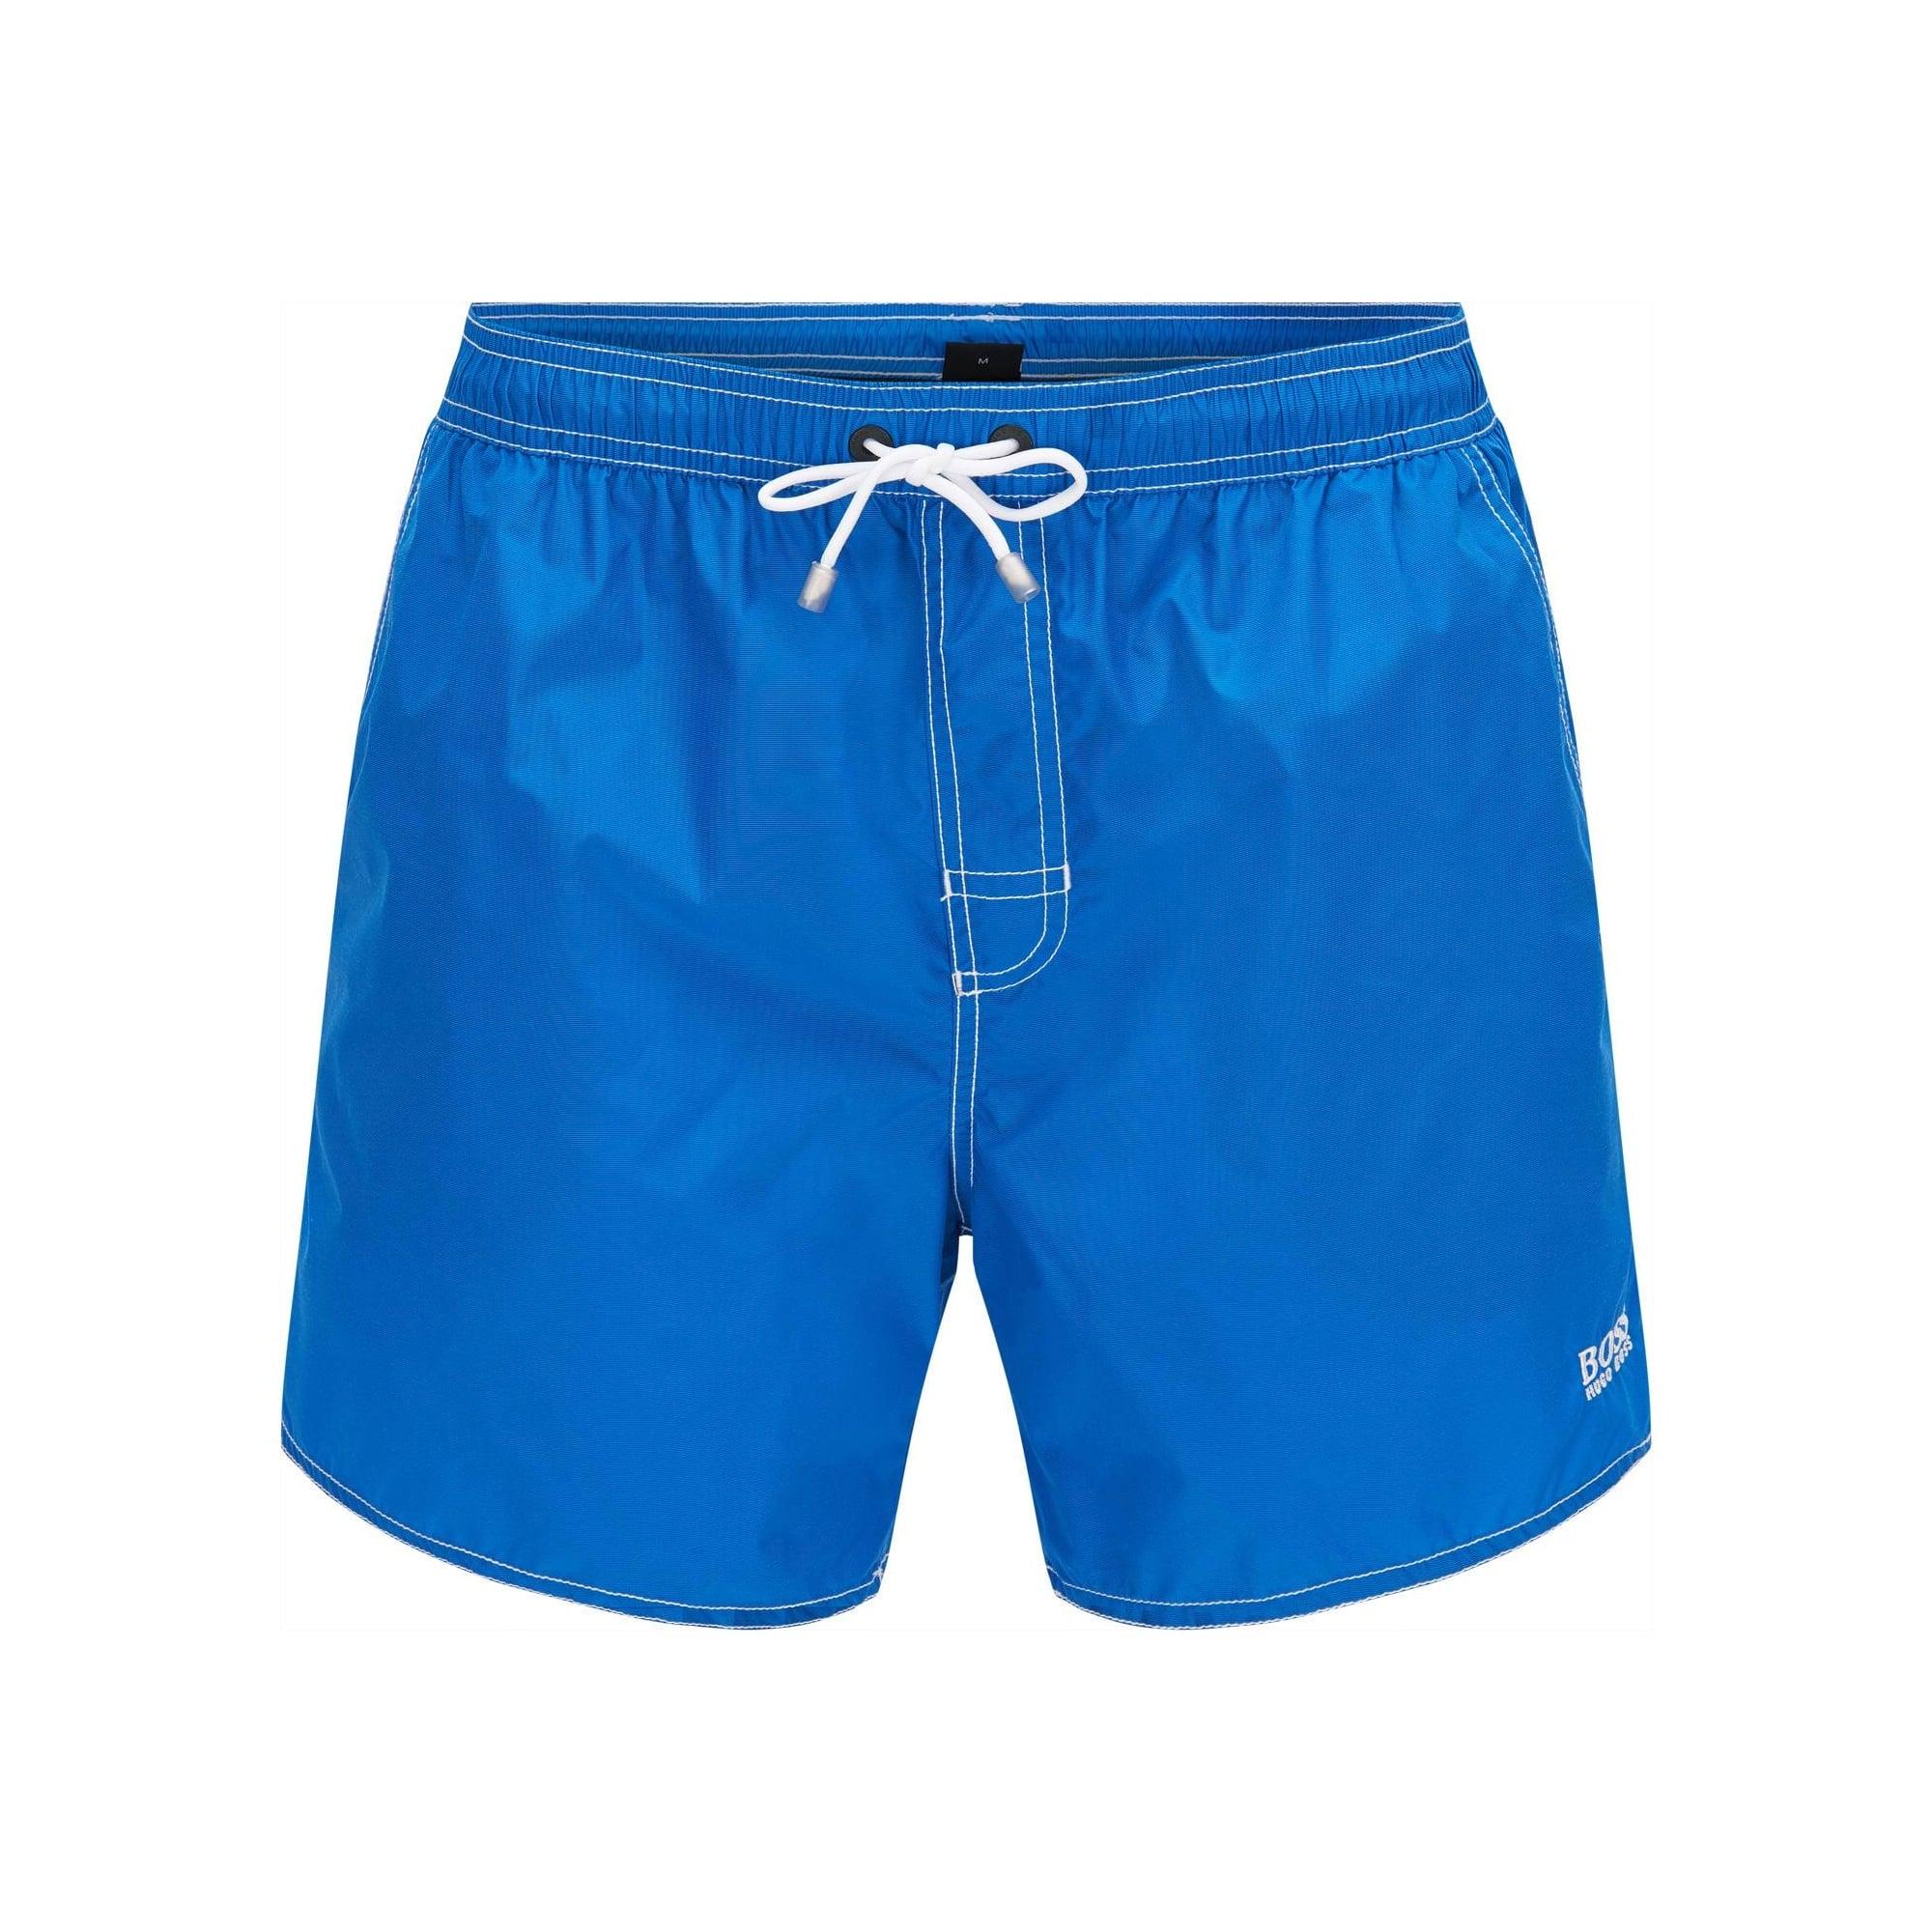 dcf15dd5212ba Hugo Boss Online | Lobster Quick Dry Bright Blue Swim Shorts